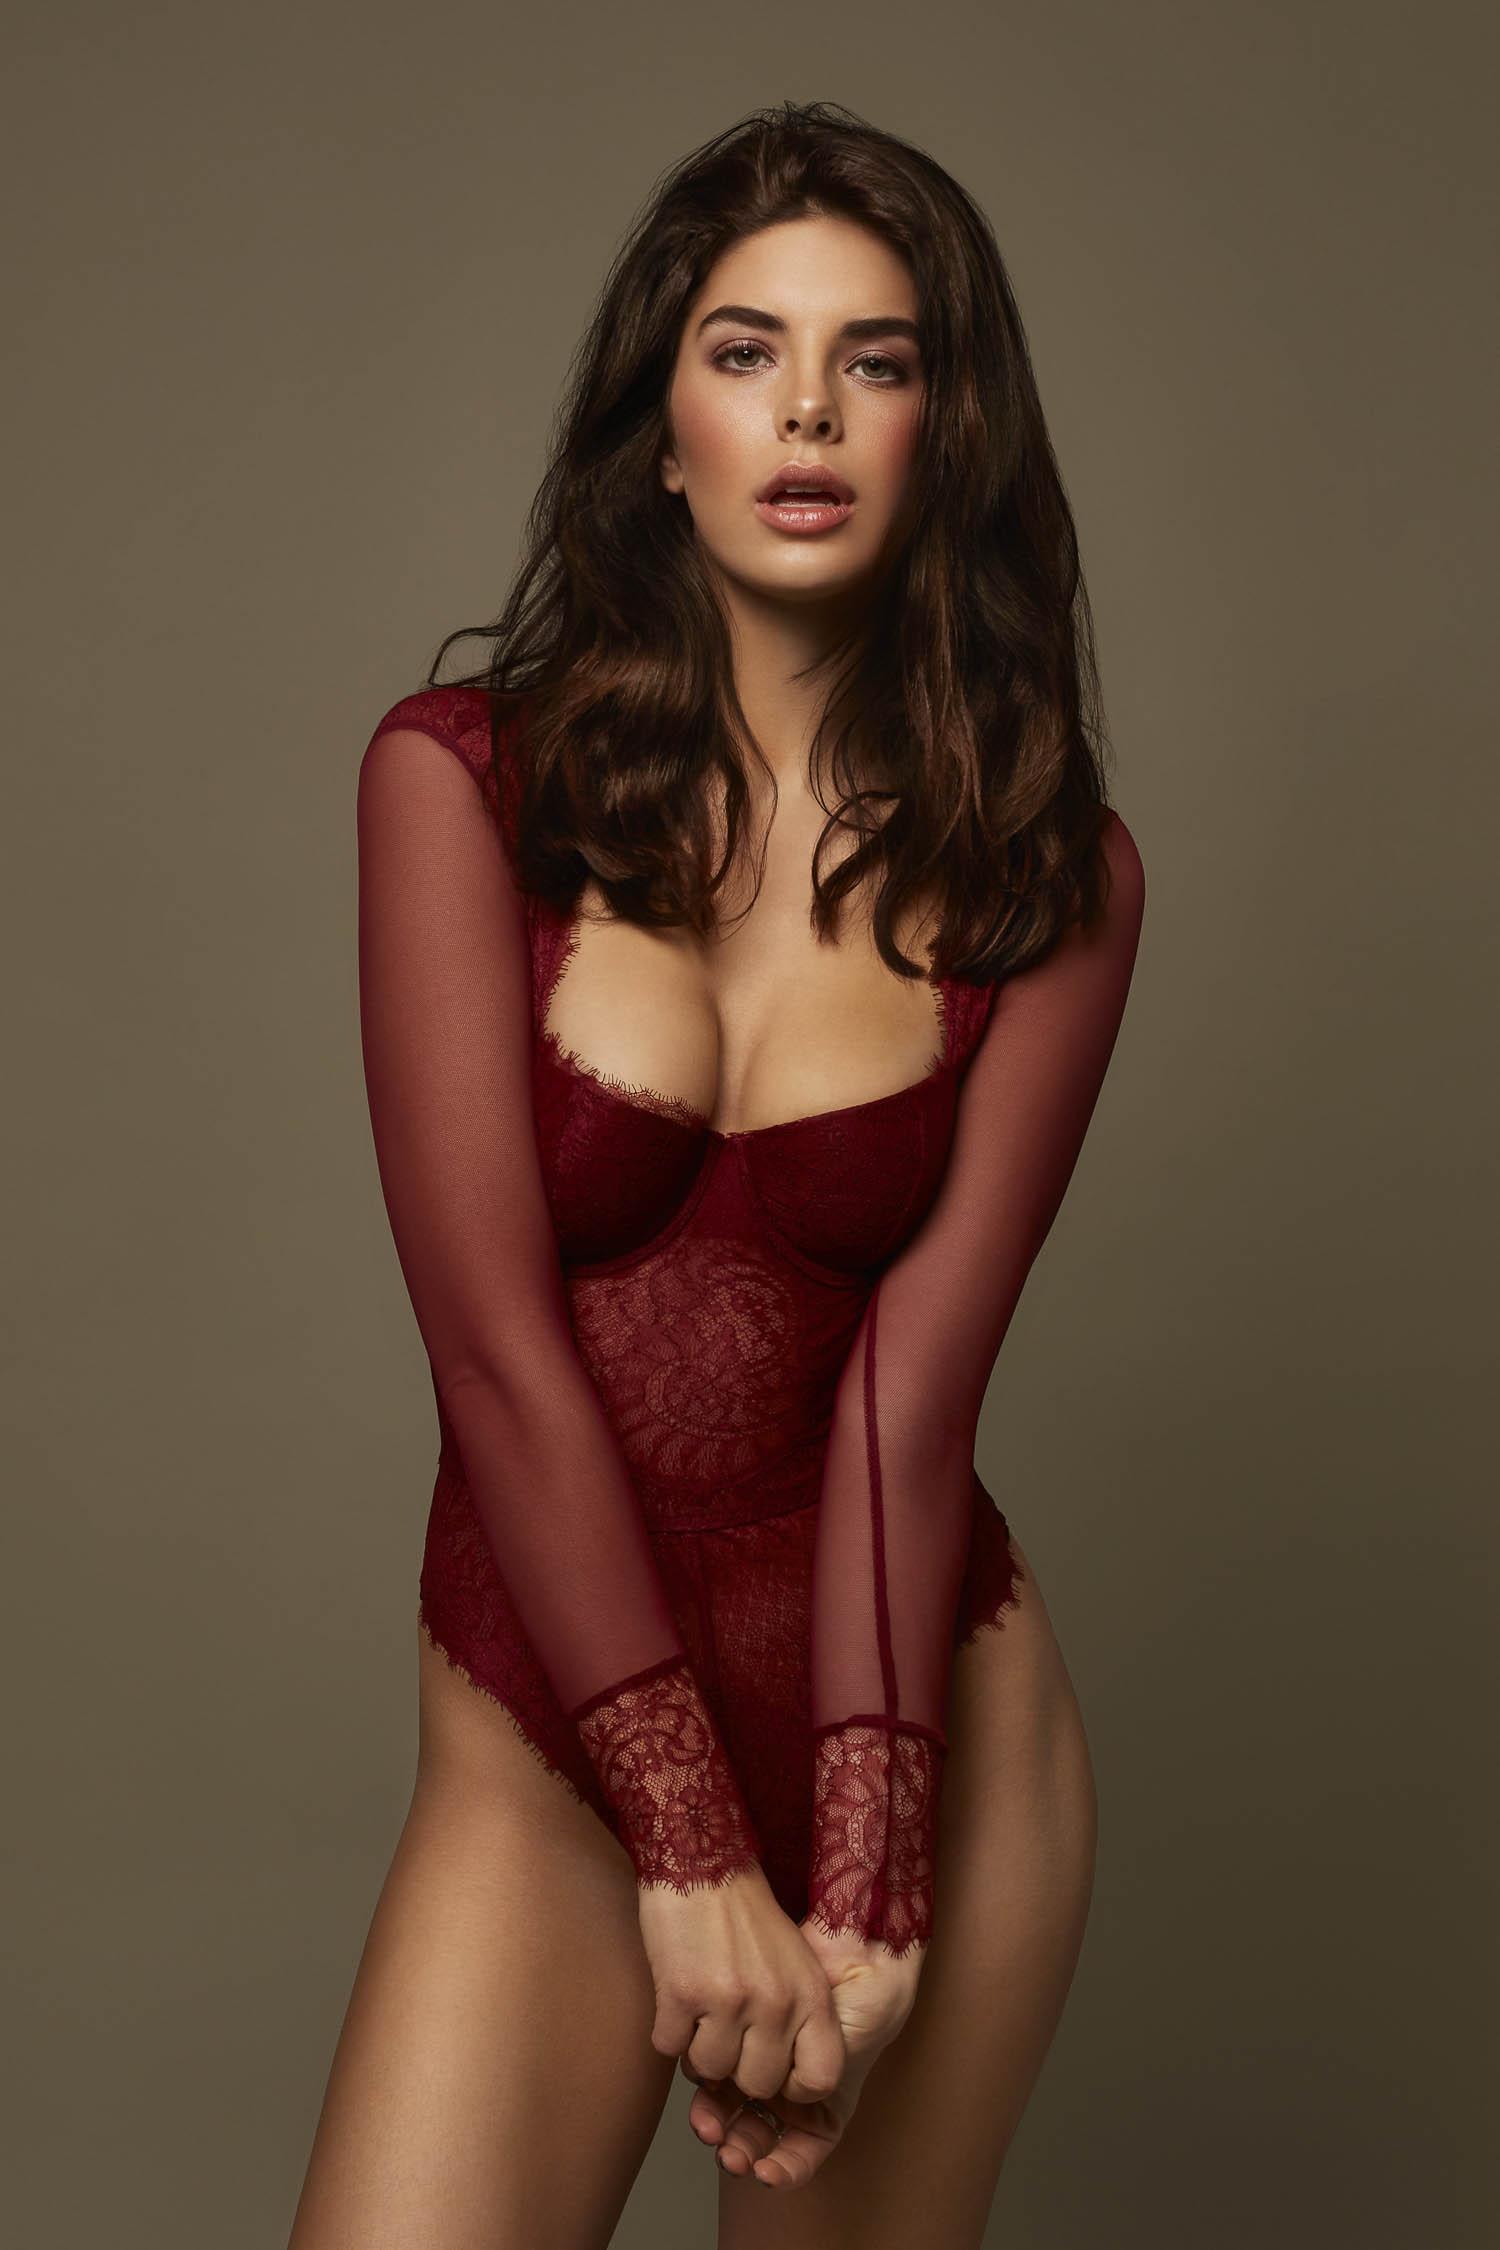 Brunette model wearing long sleeve burgundy jumpsuit